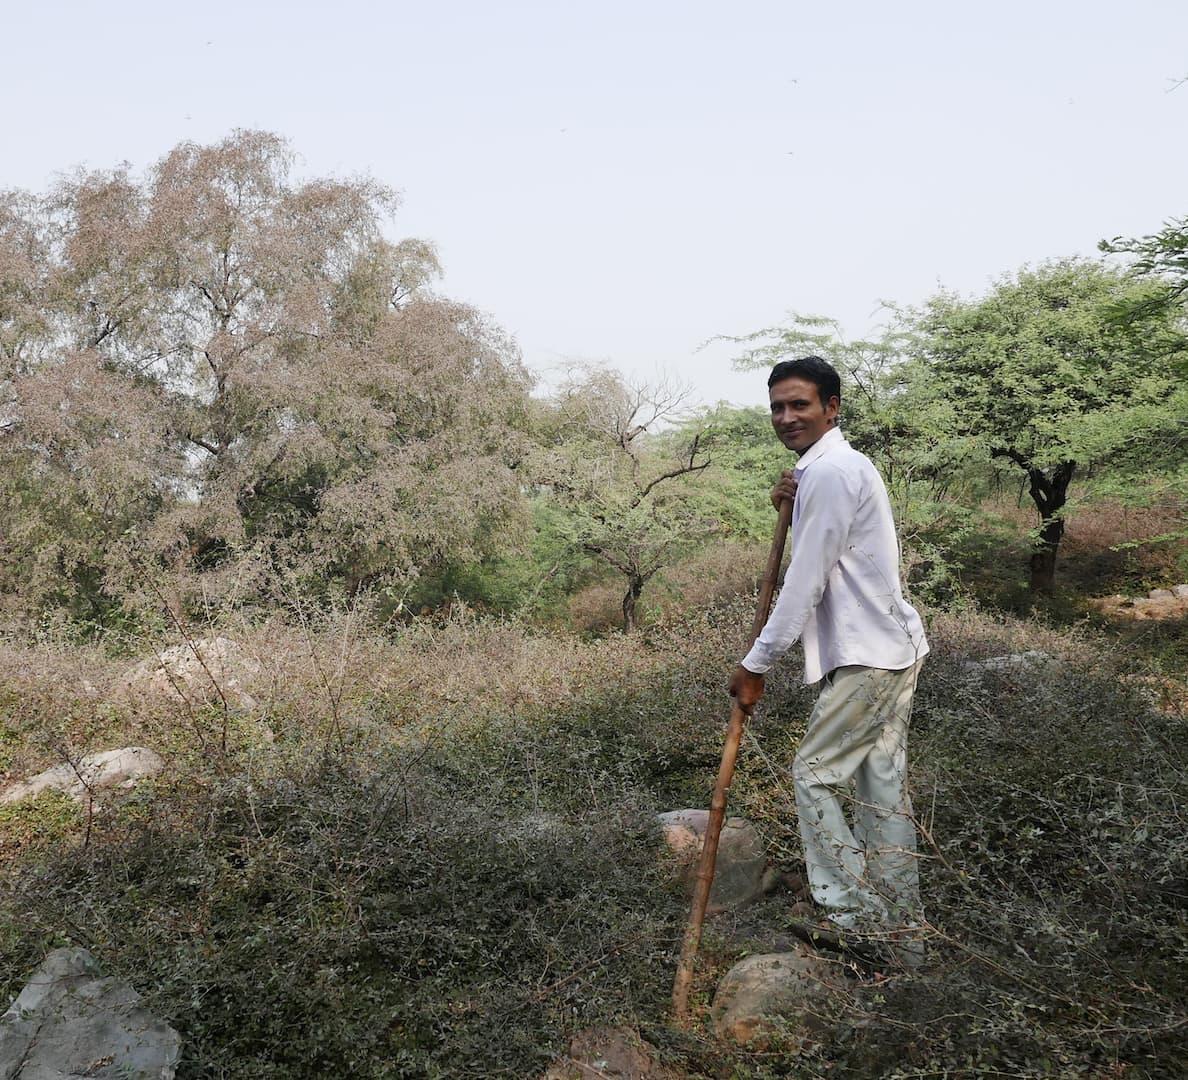 Sunil Harsana, the Pied Piper of Mangar Bani Forest